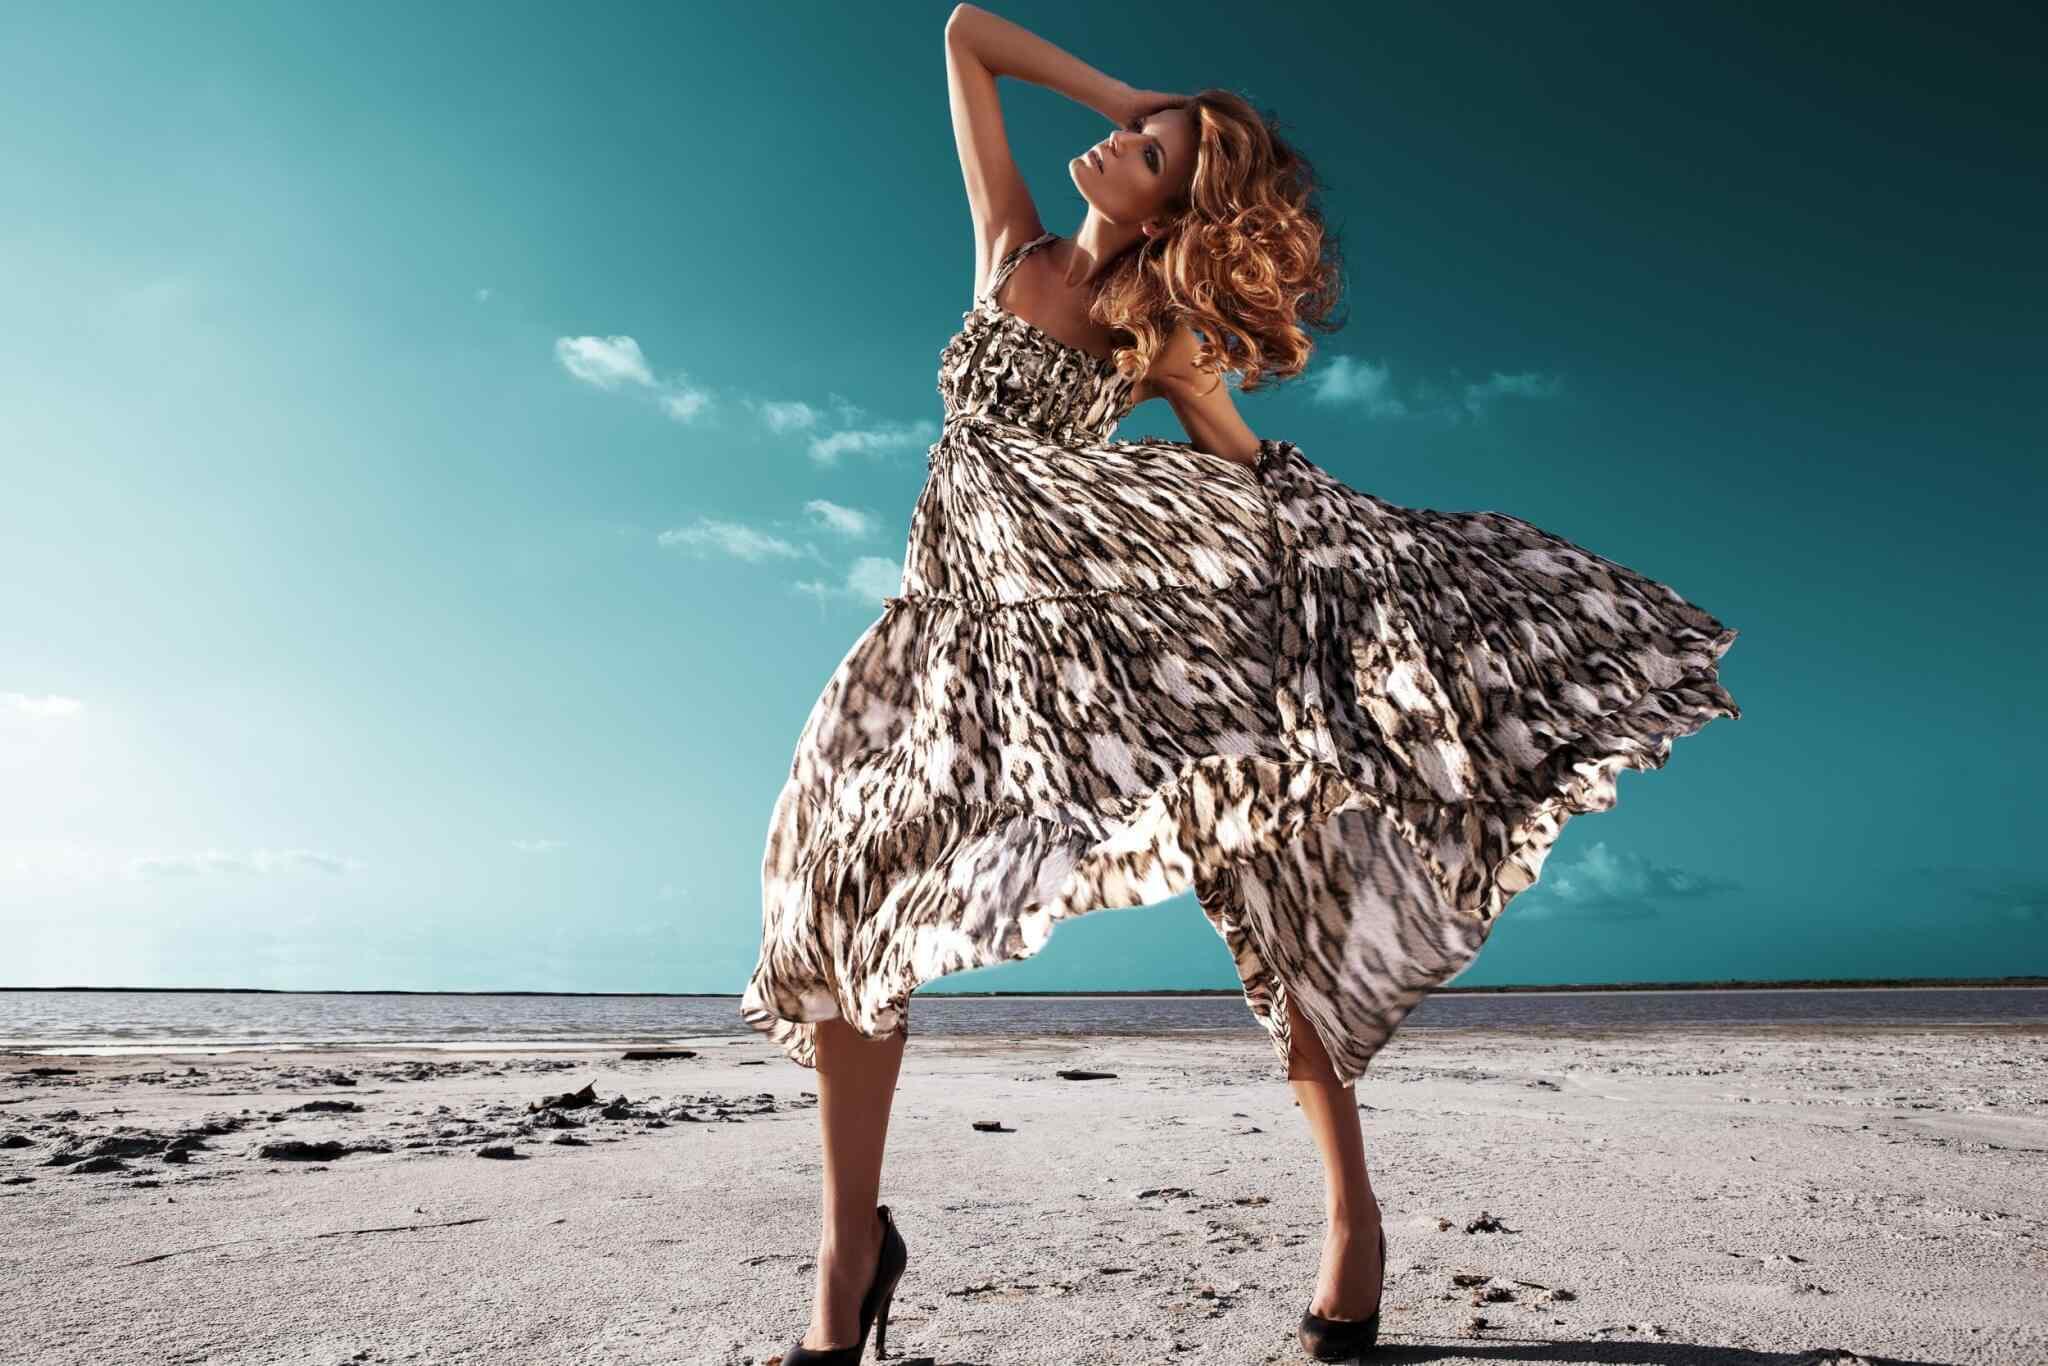 http://bilimya.com/wp-content/uploads/2017/03/fashion_3.jpg